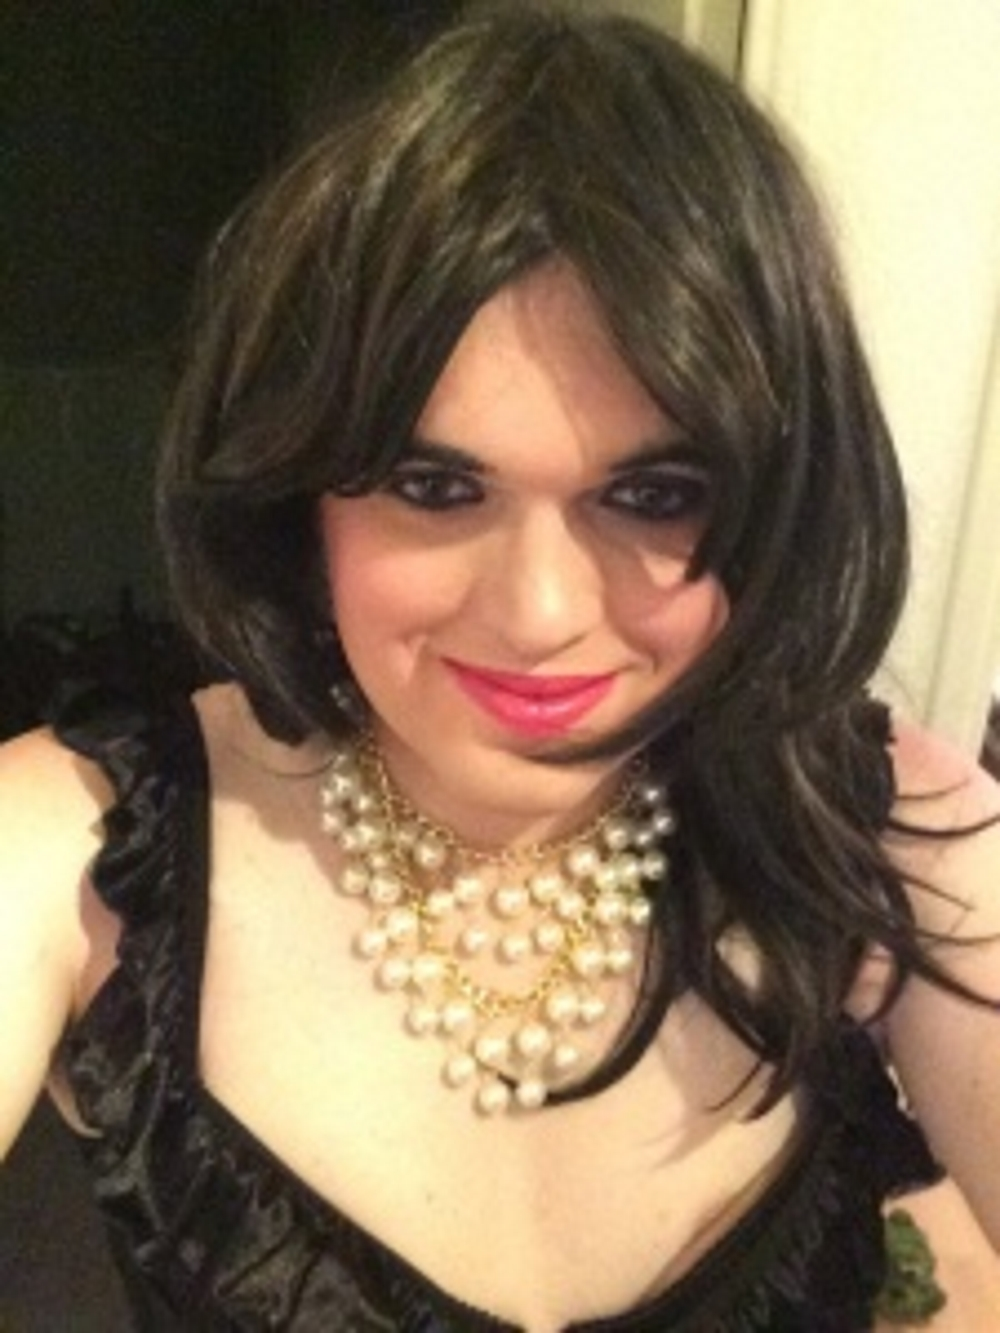 Geile Trans TV Sklavin Rebecca aus Meyrin (GE) sucht TV Erziehung